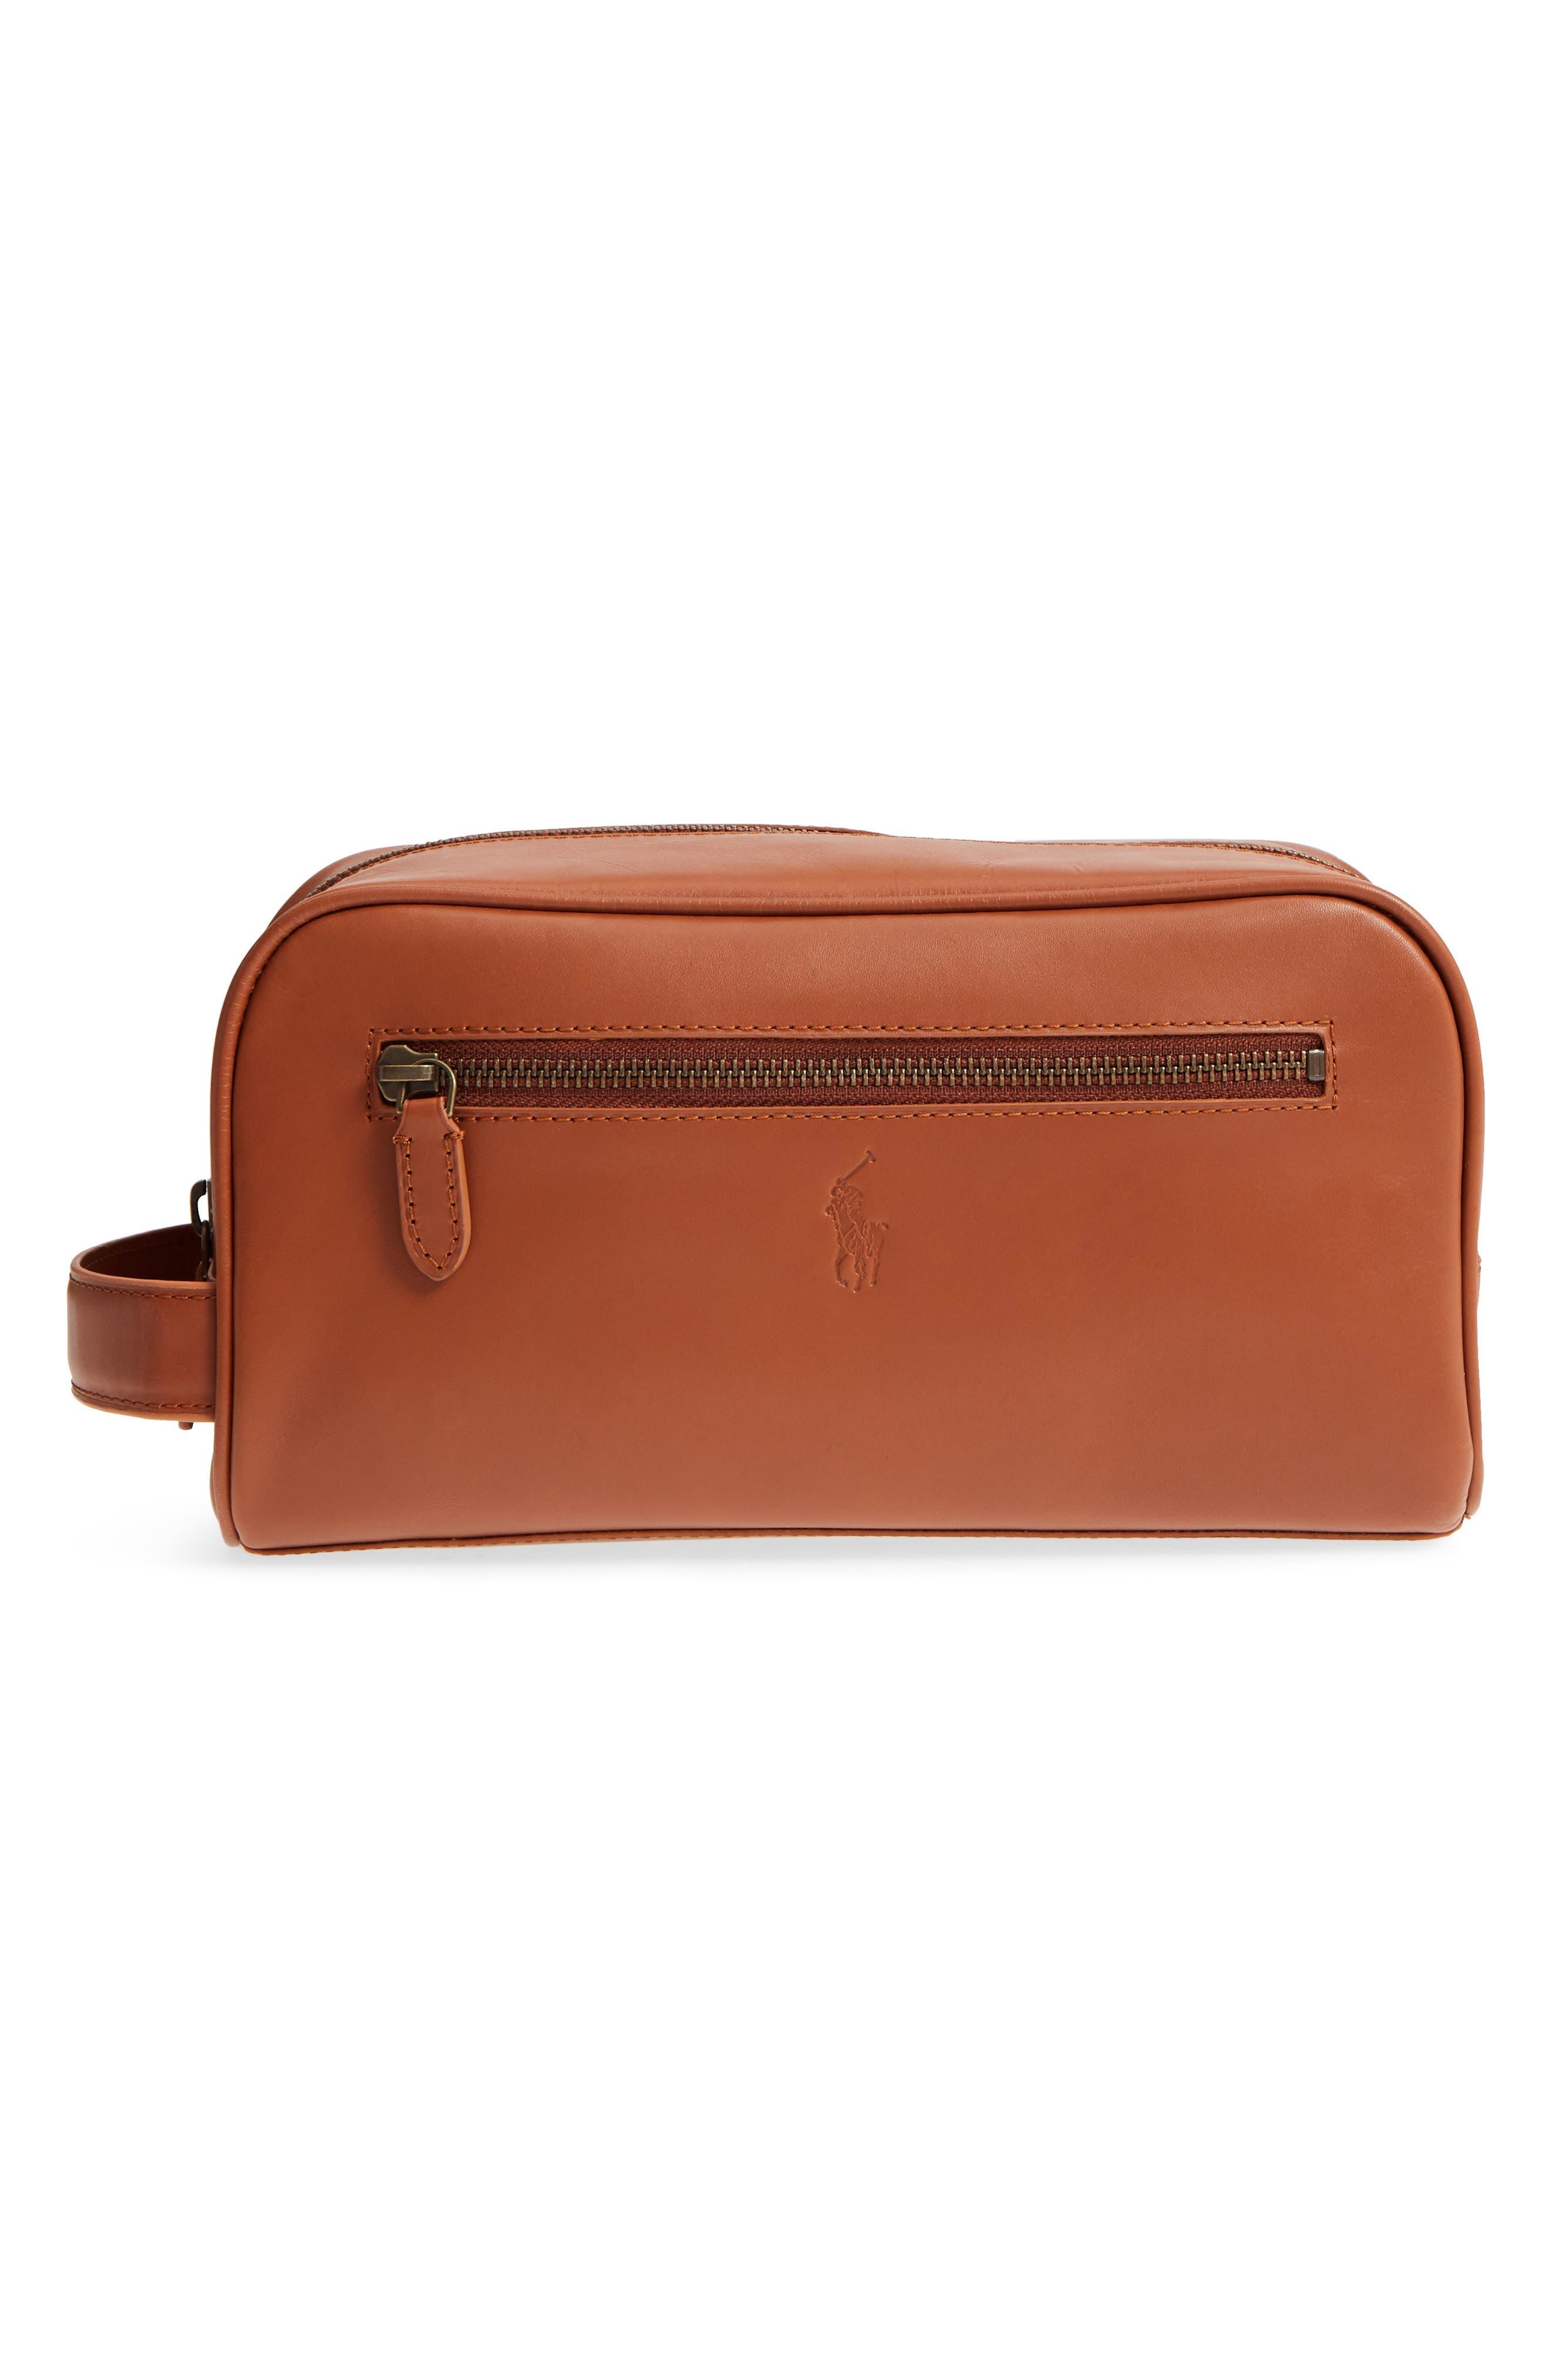 Polo Ralph Lauren Leather Dopp Kit